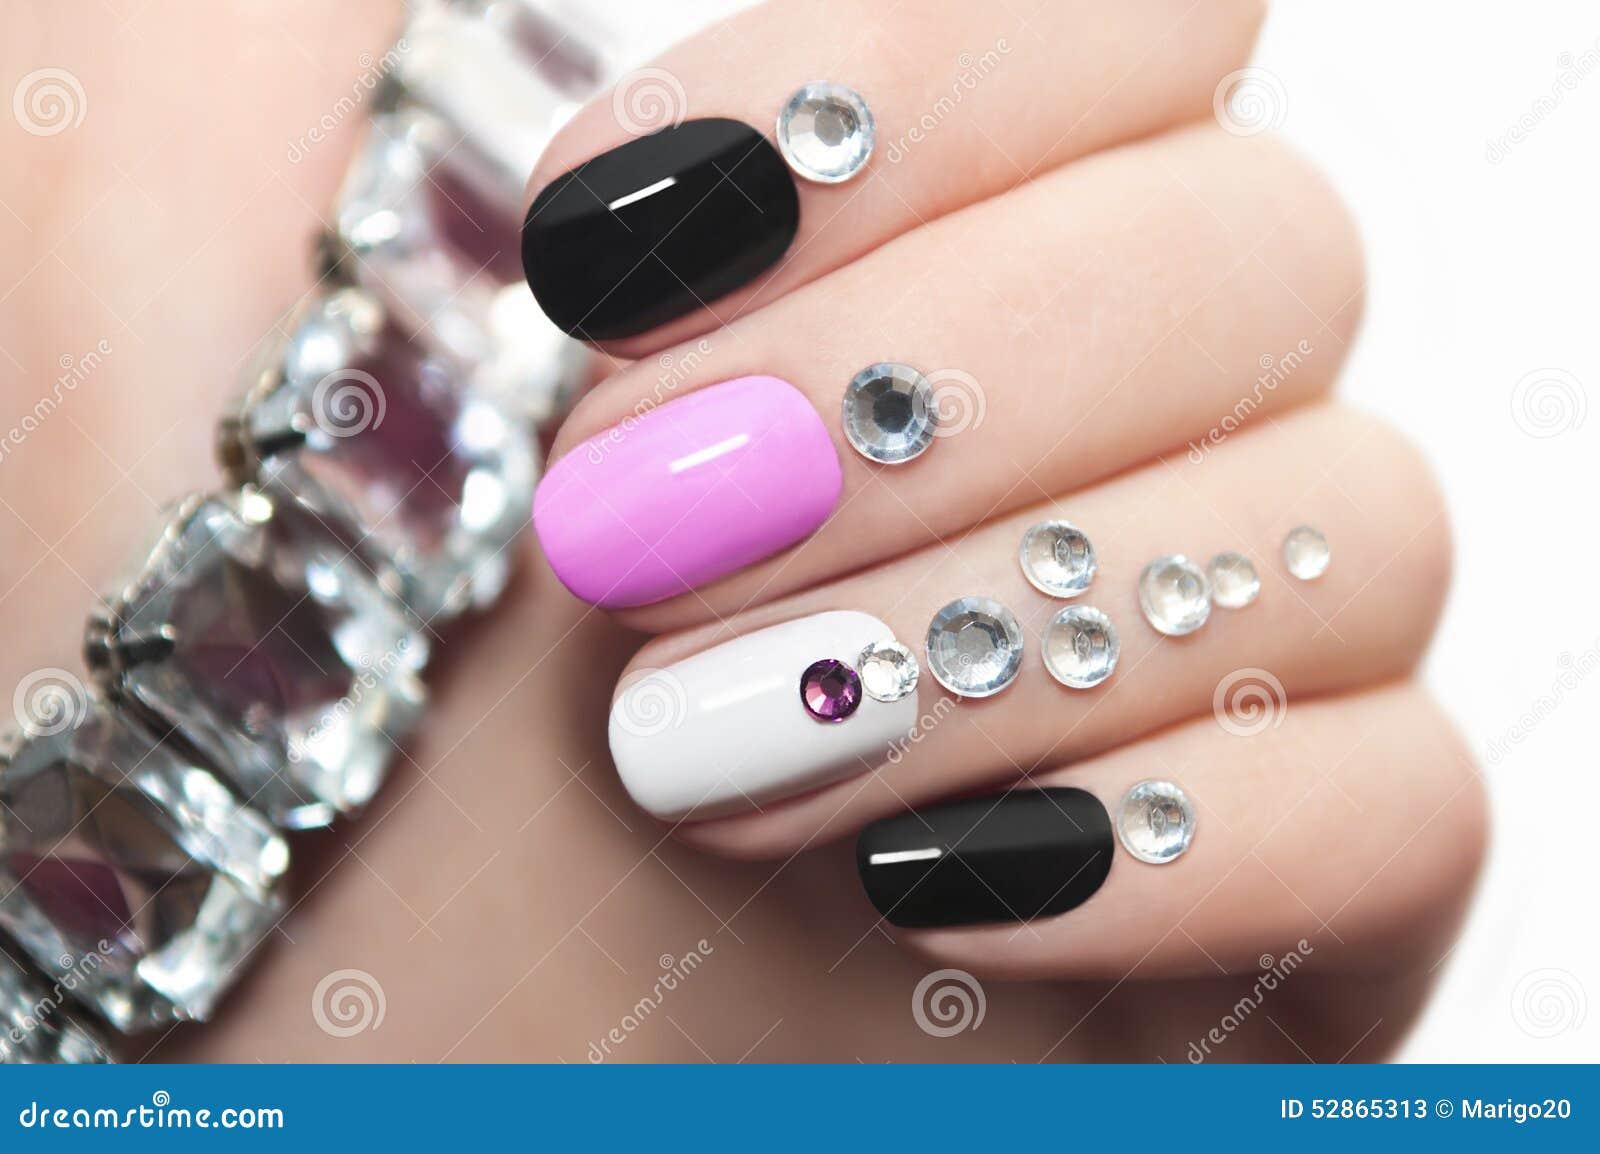 Manicure with rhinestones.